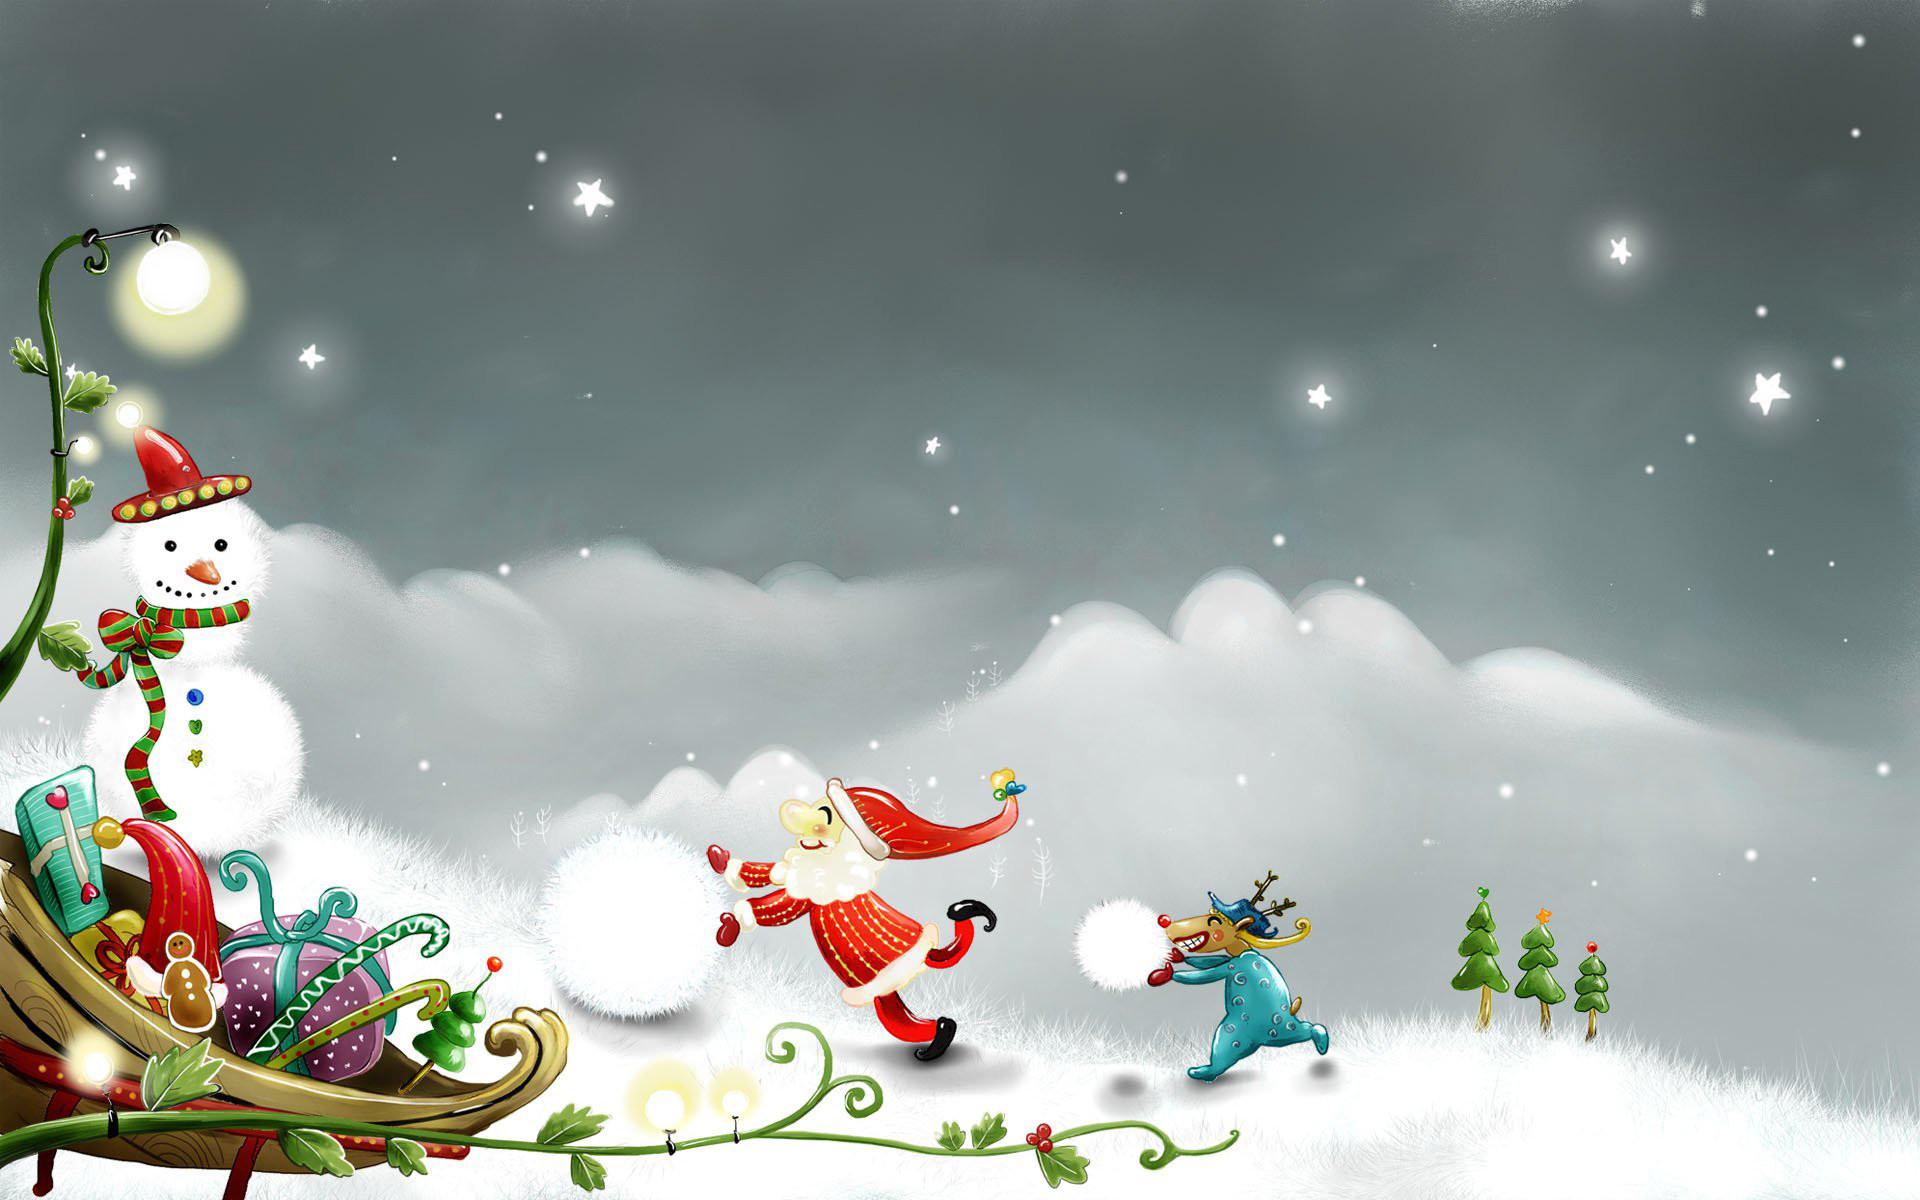 Christmas Wallpaper Free.Desktop Christmas Wallpapers Backgrounds Wallpapertag